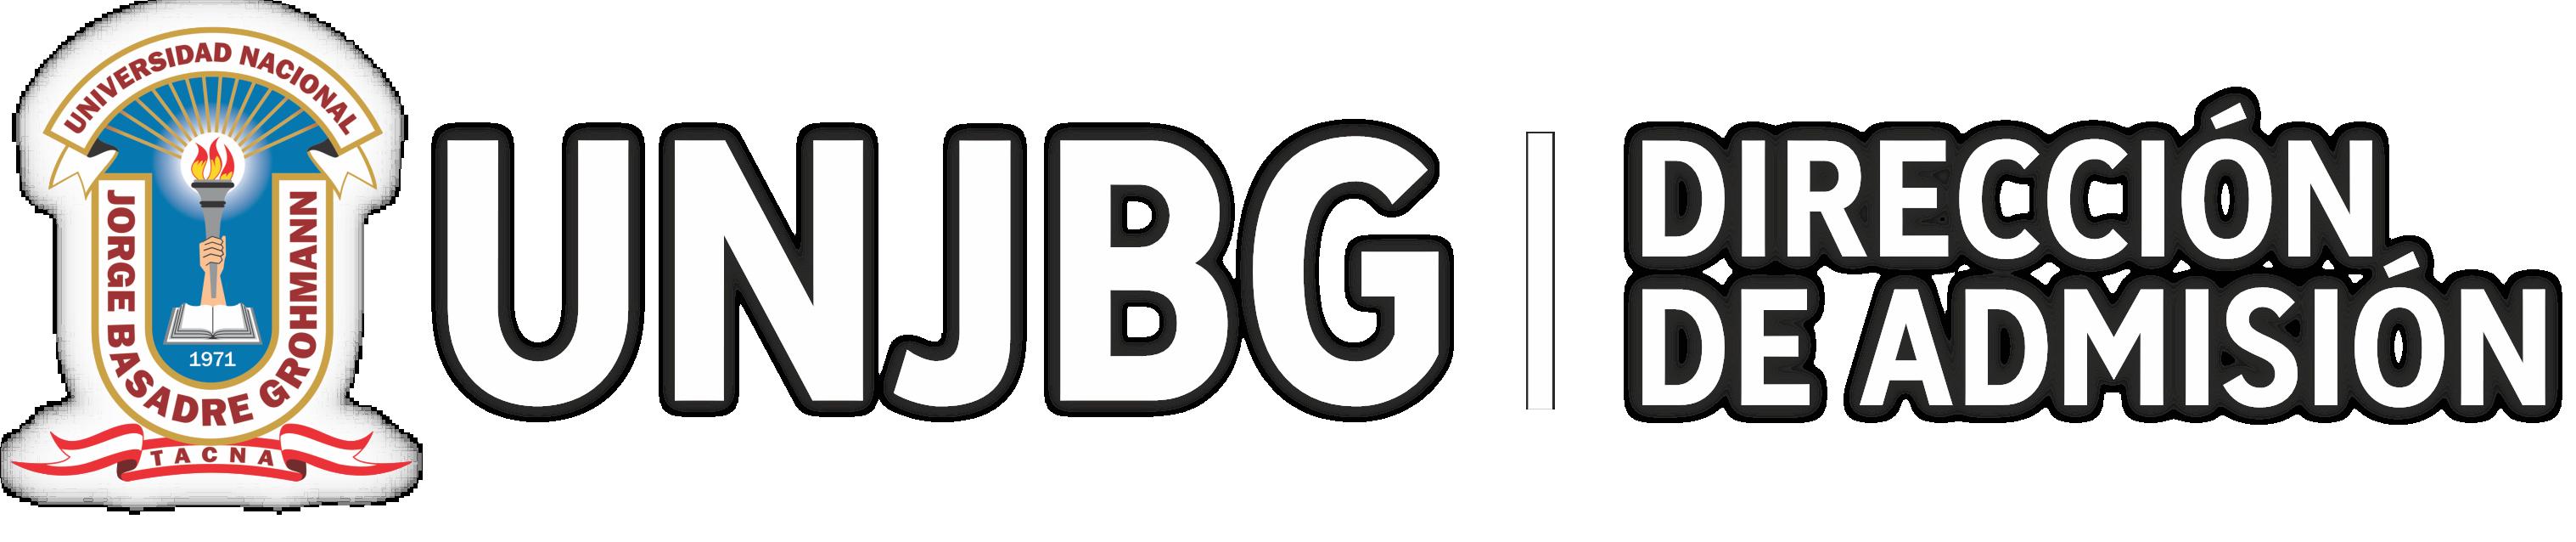 LOGO HEADER PAGINA WEB + grande